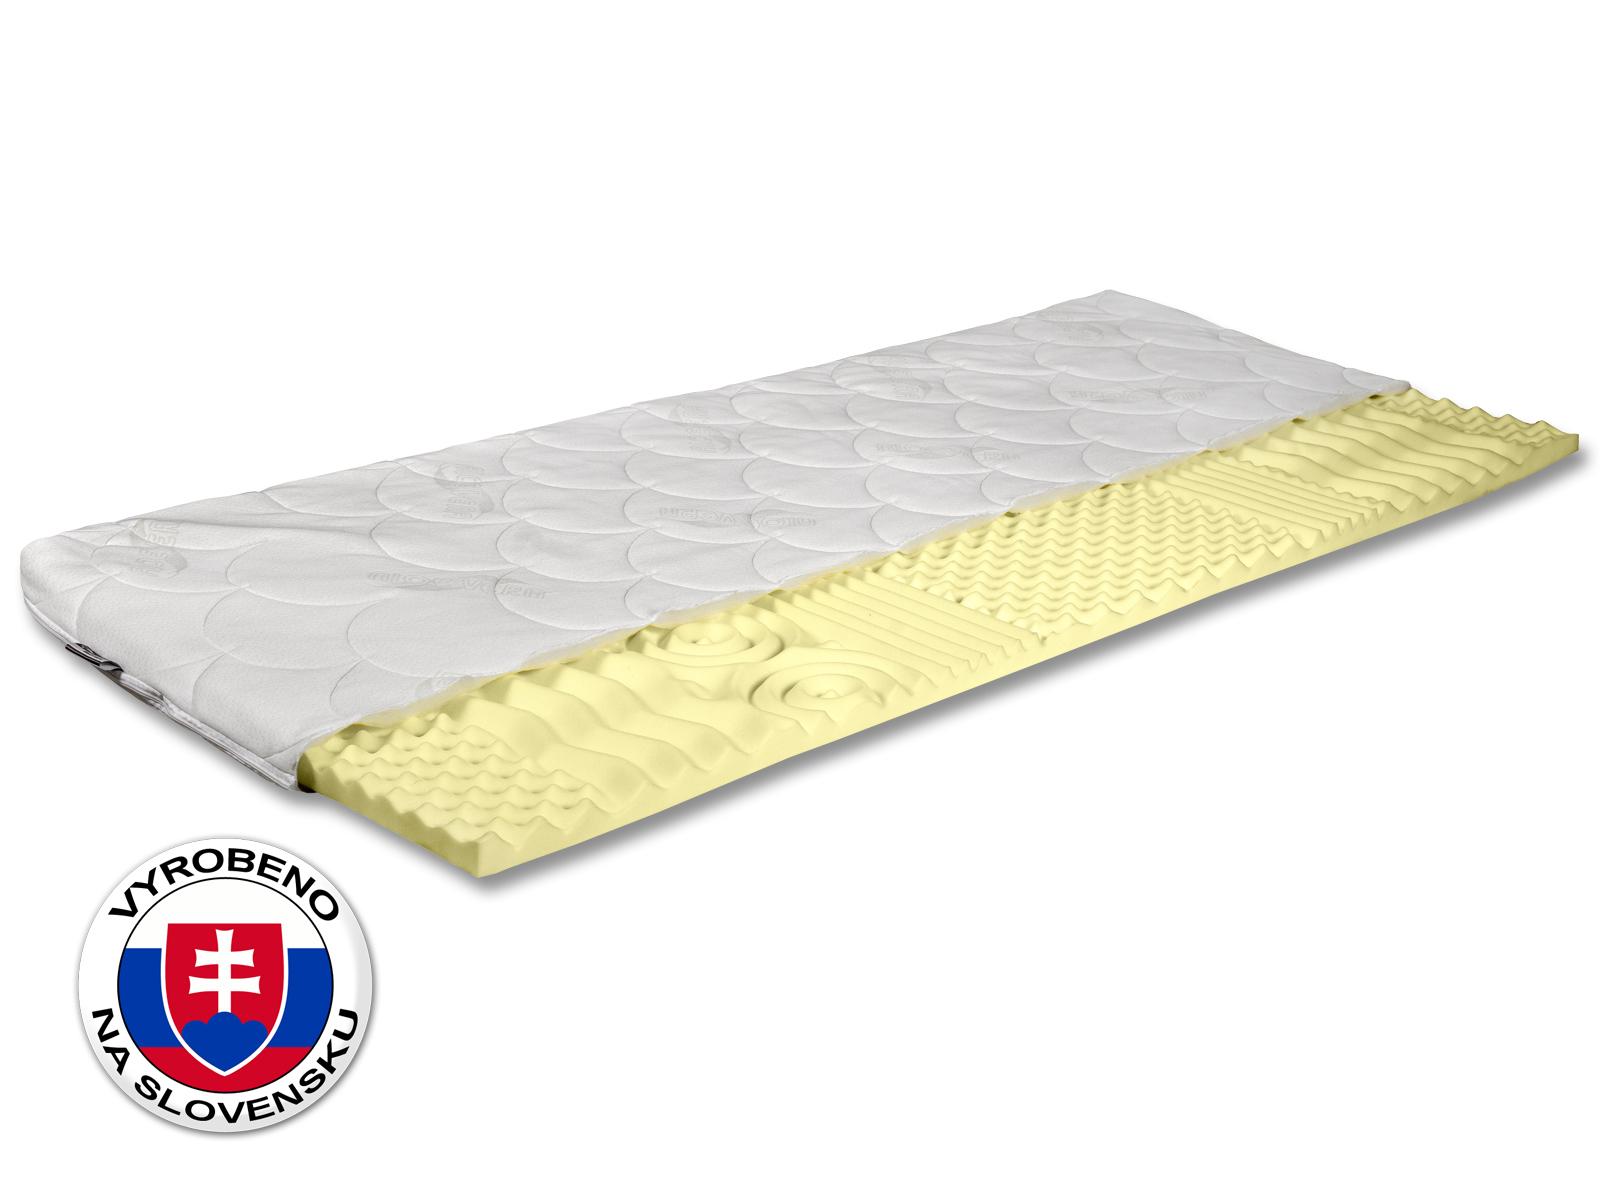 Pěnová matrace - Benab - Topper Visco 7 - Atypický rozměr (cena za 1 m2) (T2)